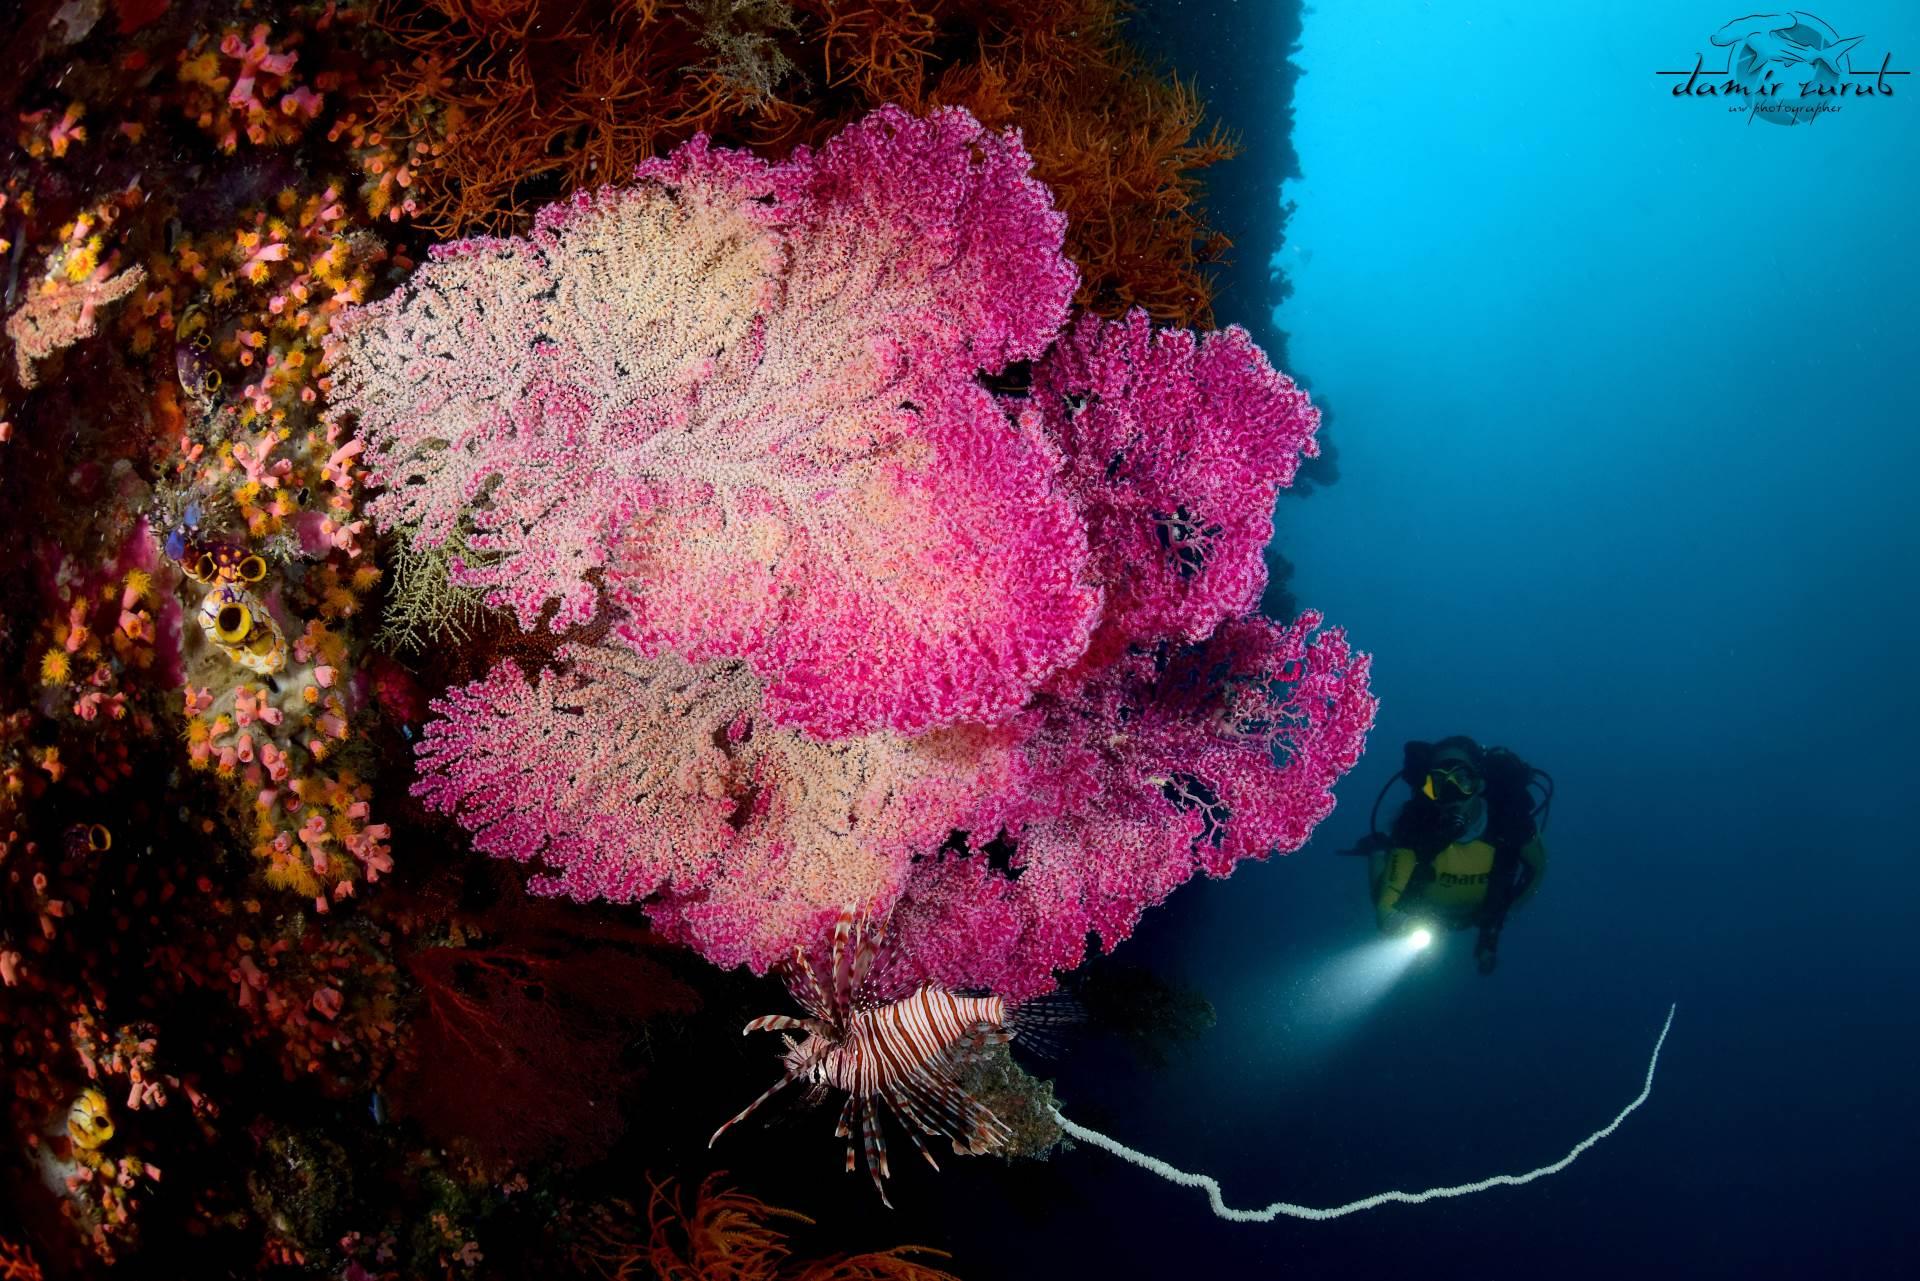 Lion fish & sea fans.  Courtesy of Damir Zurub of Klub putnika istraživača Odisej